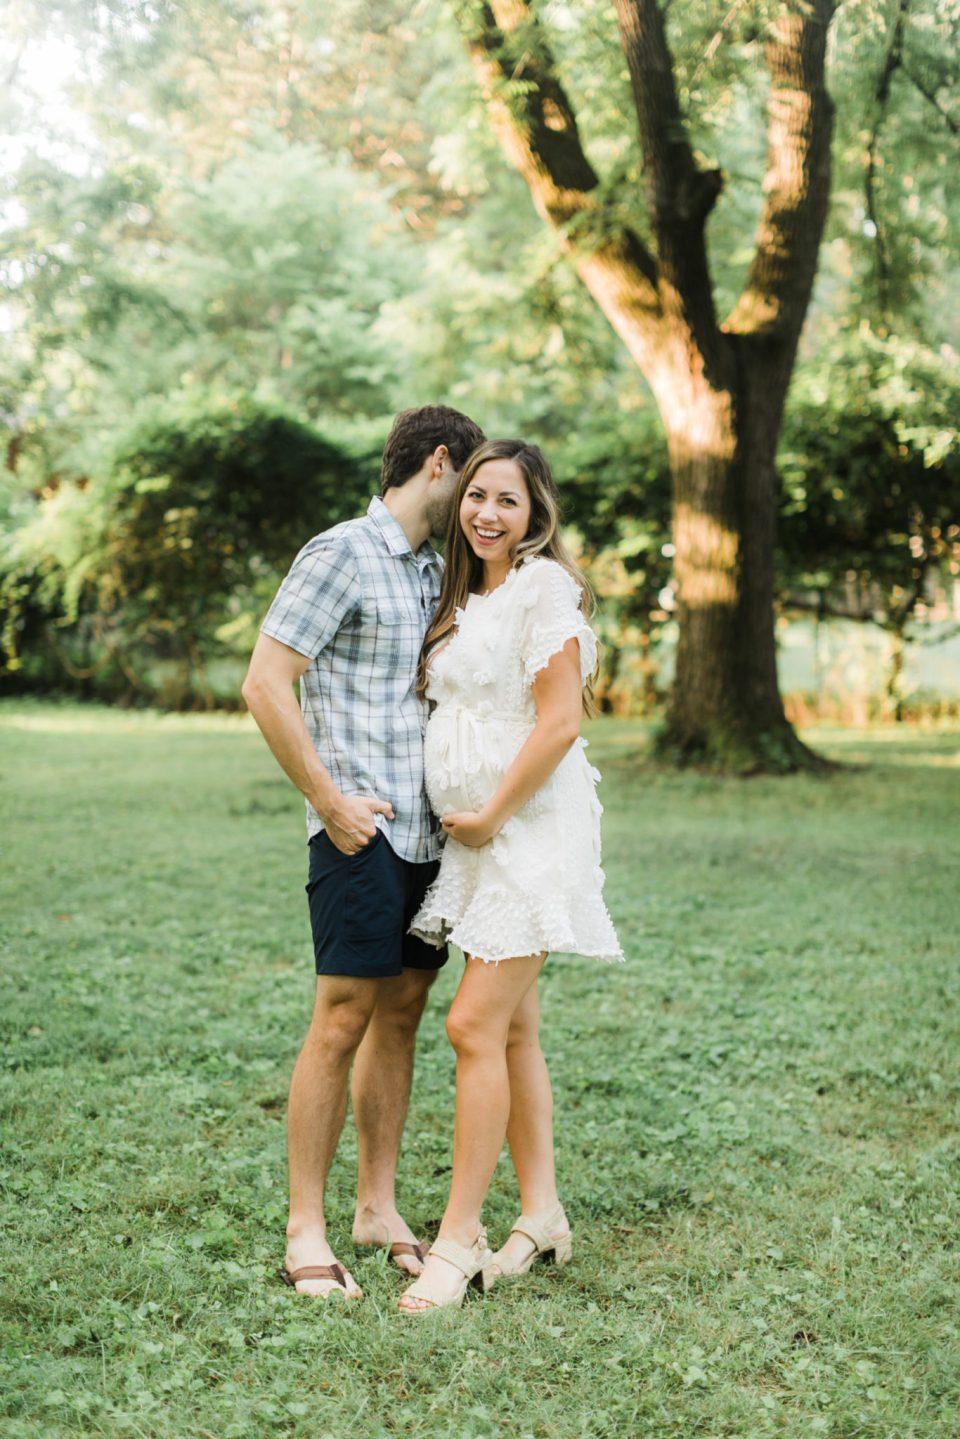 Elizabeth-McCravy-Maternity-Photos-Full-11 copy